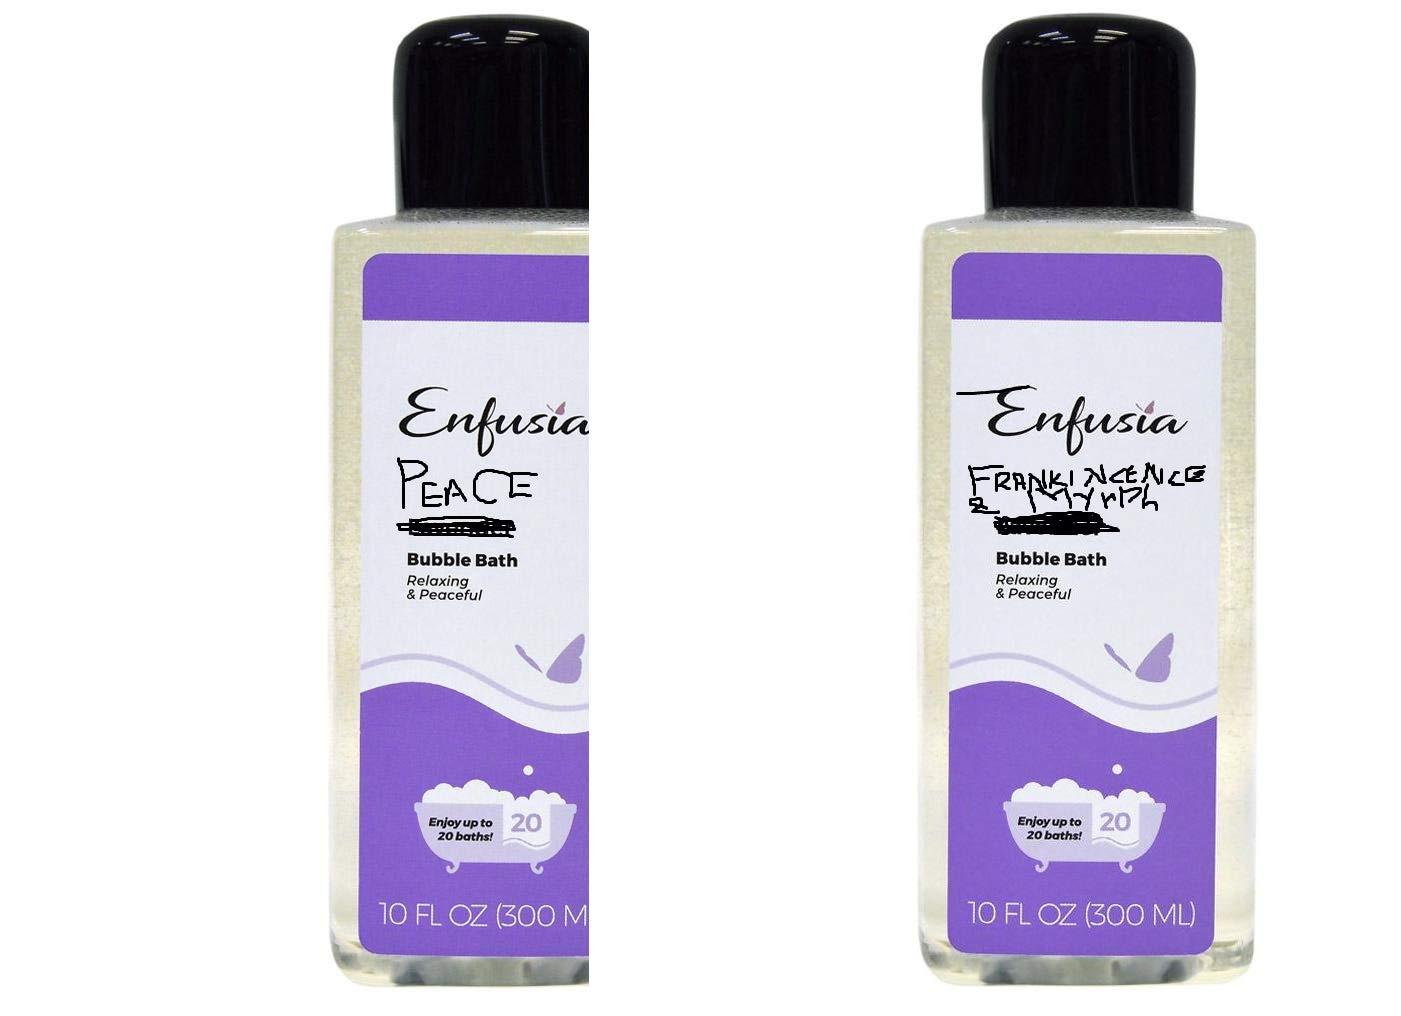 Bubble Bath 10 oz -Peace Perfectly Harmonious & Frankincnse and Myrrh(pack of 2) upto 20 bath with each bottle by Enfusia